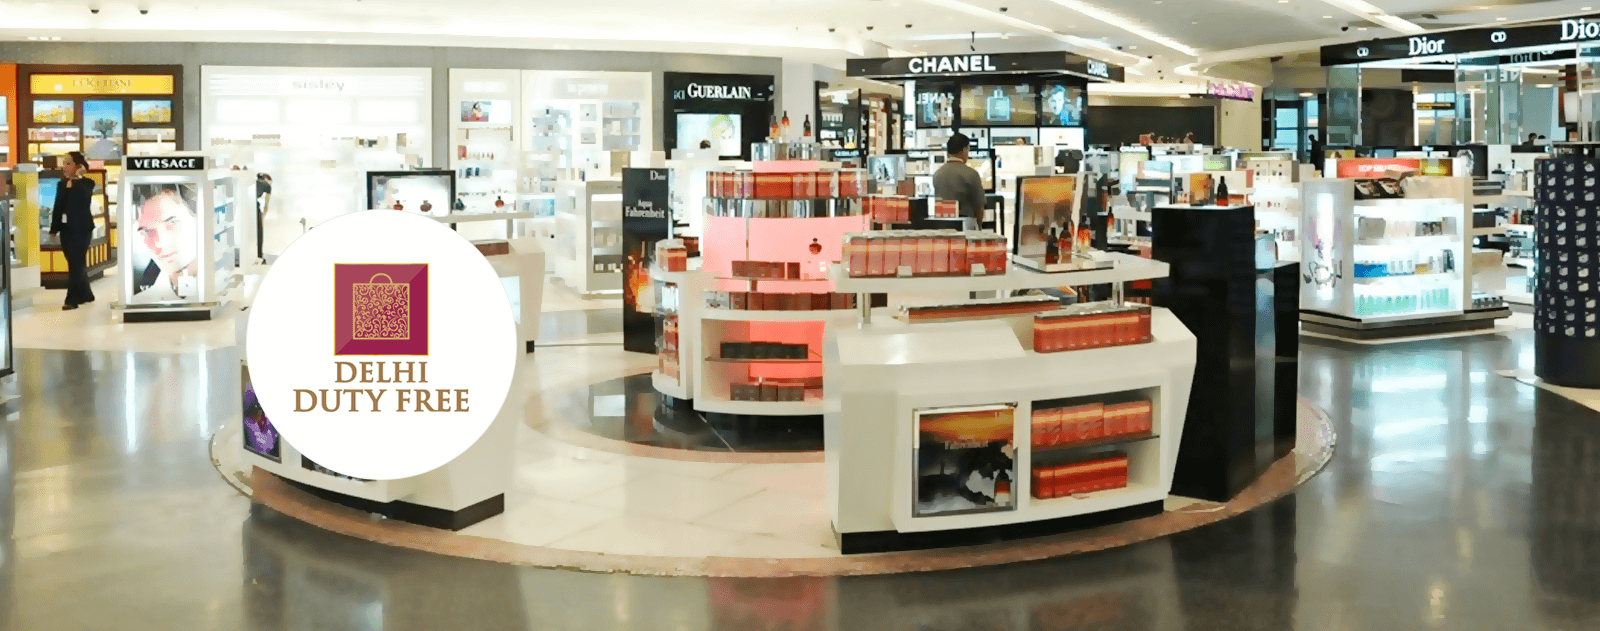 Pine Labs Merchants Success Stories: Delhi Duty Free